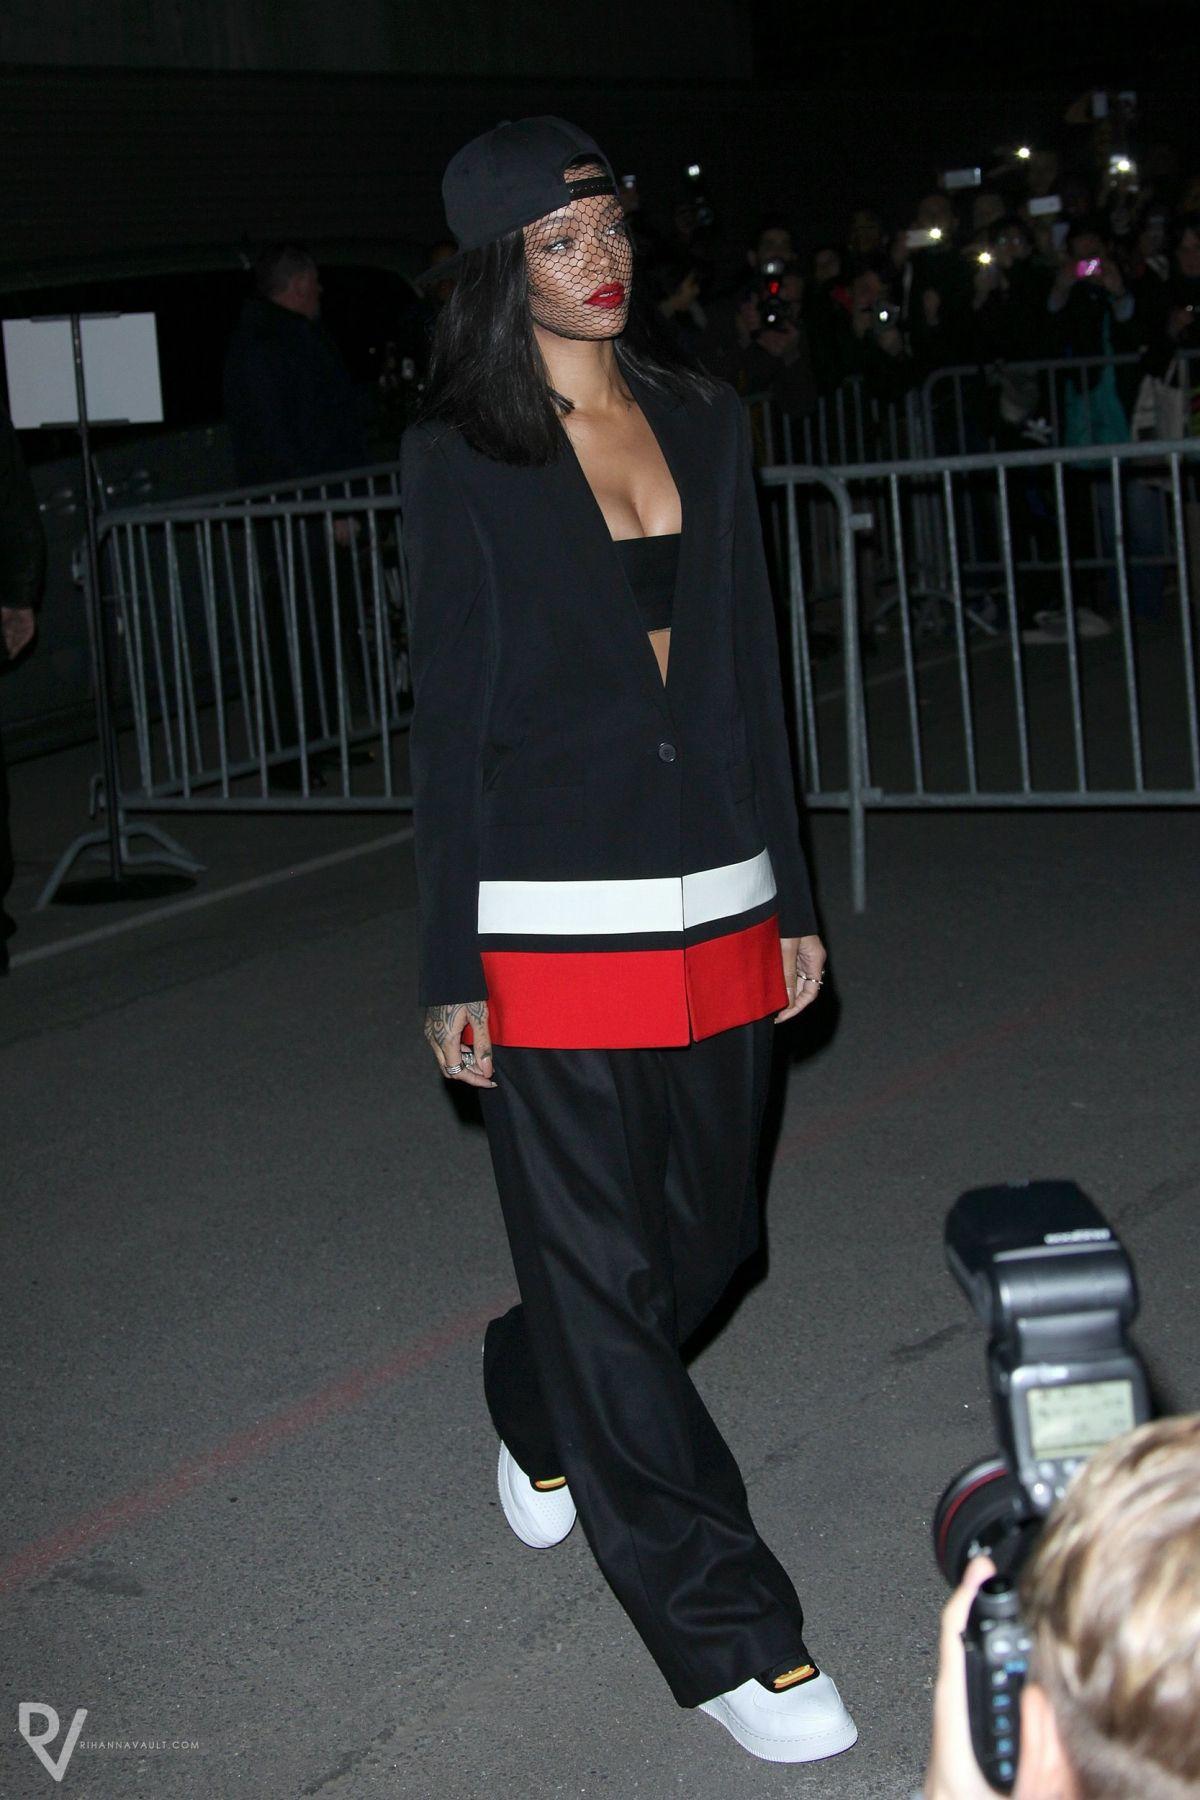 Rihanna wearing Givenchy Pre-Fall 2014 Blazer Givenchy Pre-Fall 2014 Pants Riccardo Tisci x Nike Air Force I Hi Boots Givenchy Face Veil